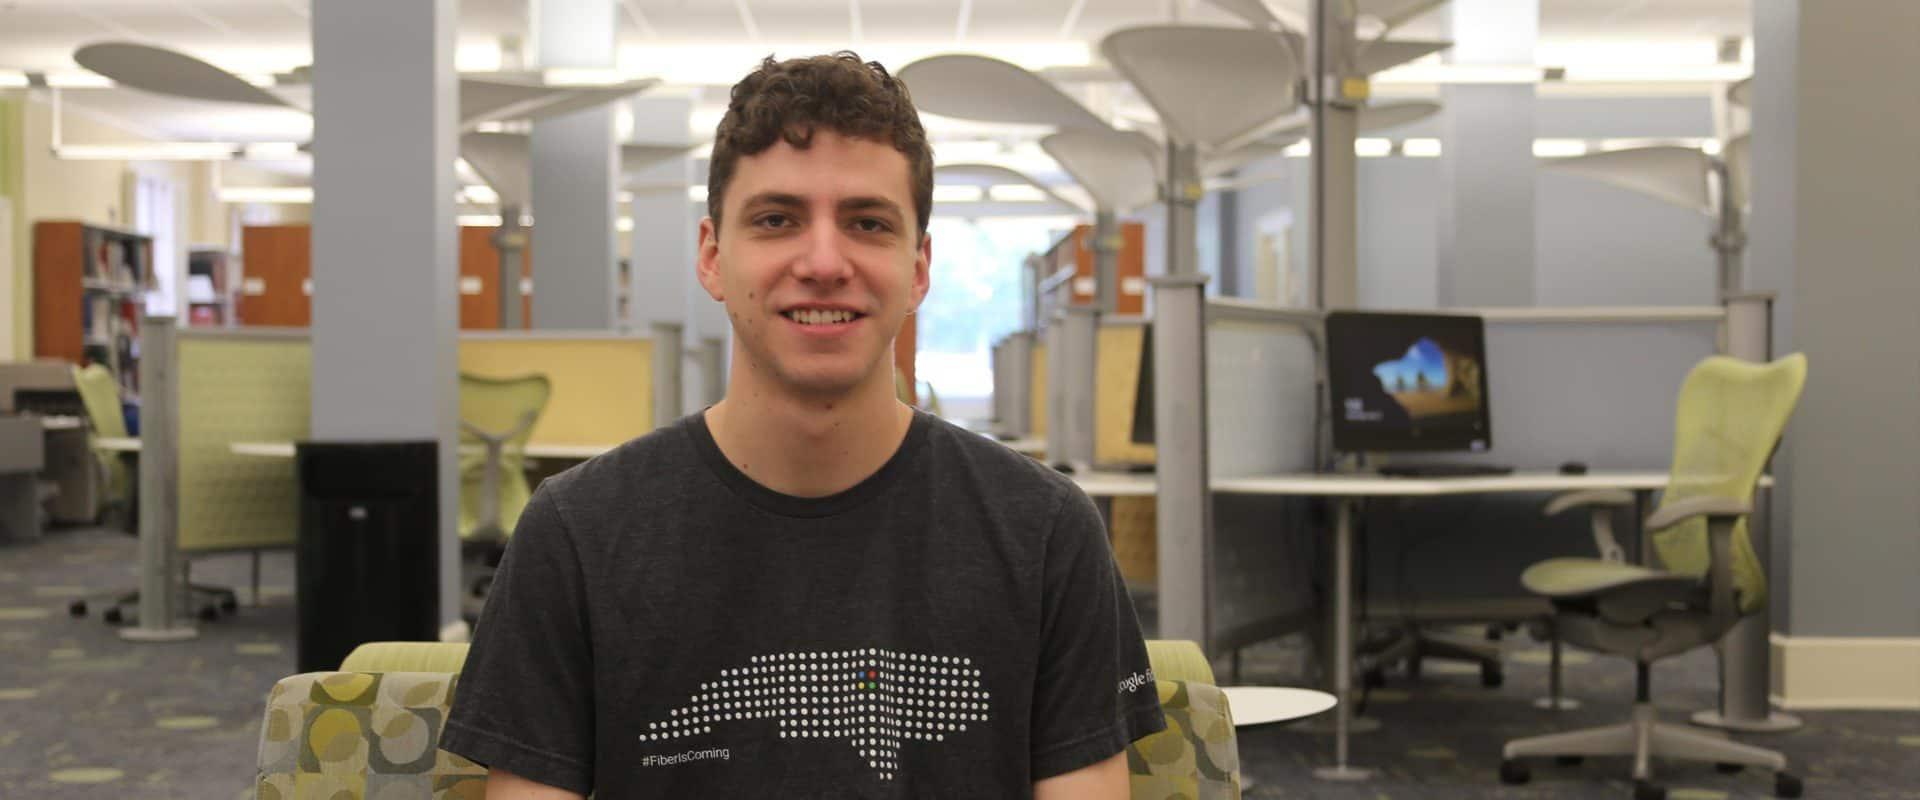 WPU Student, Coleman Arehart